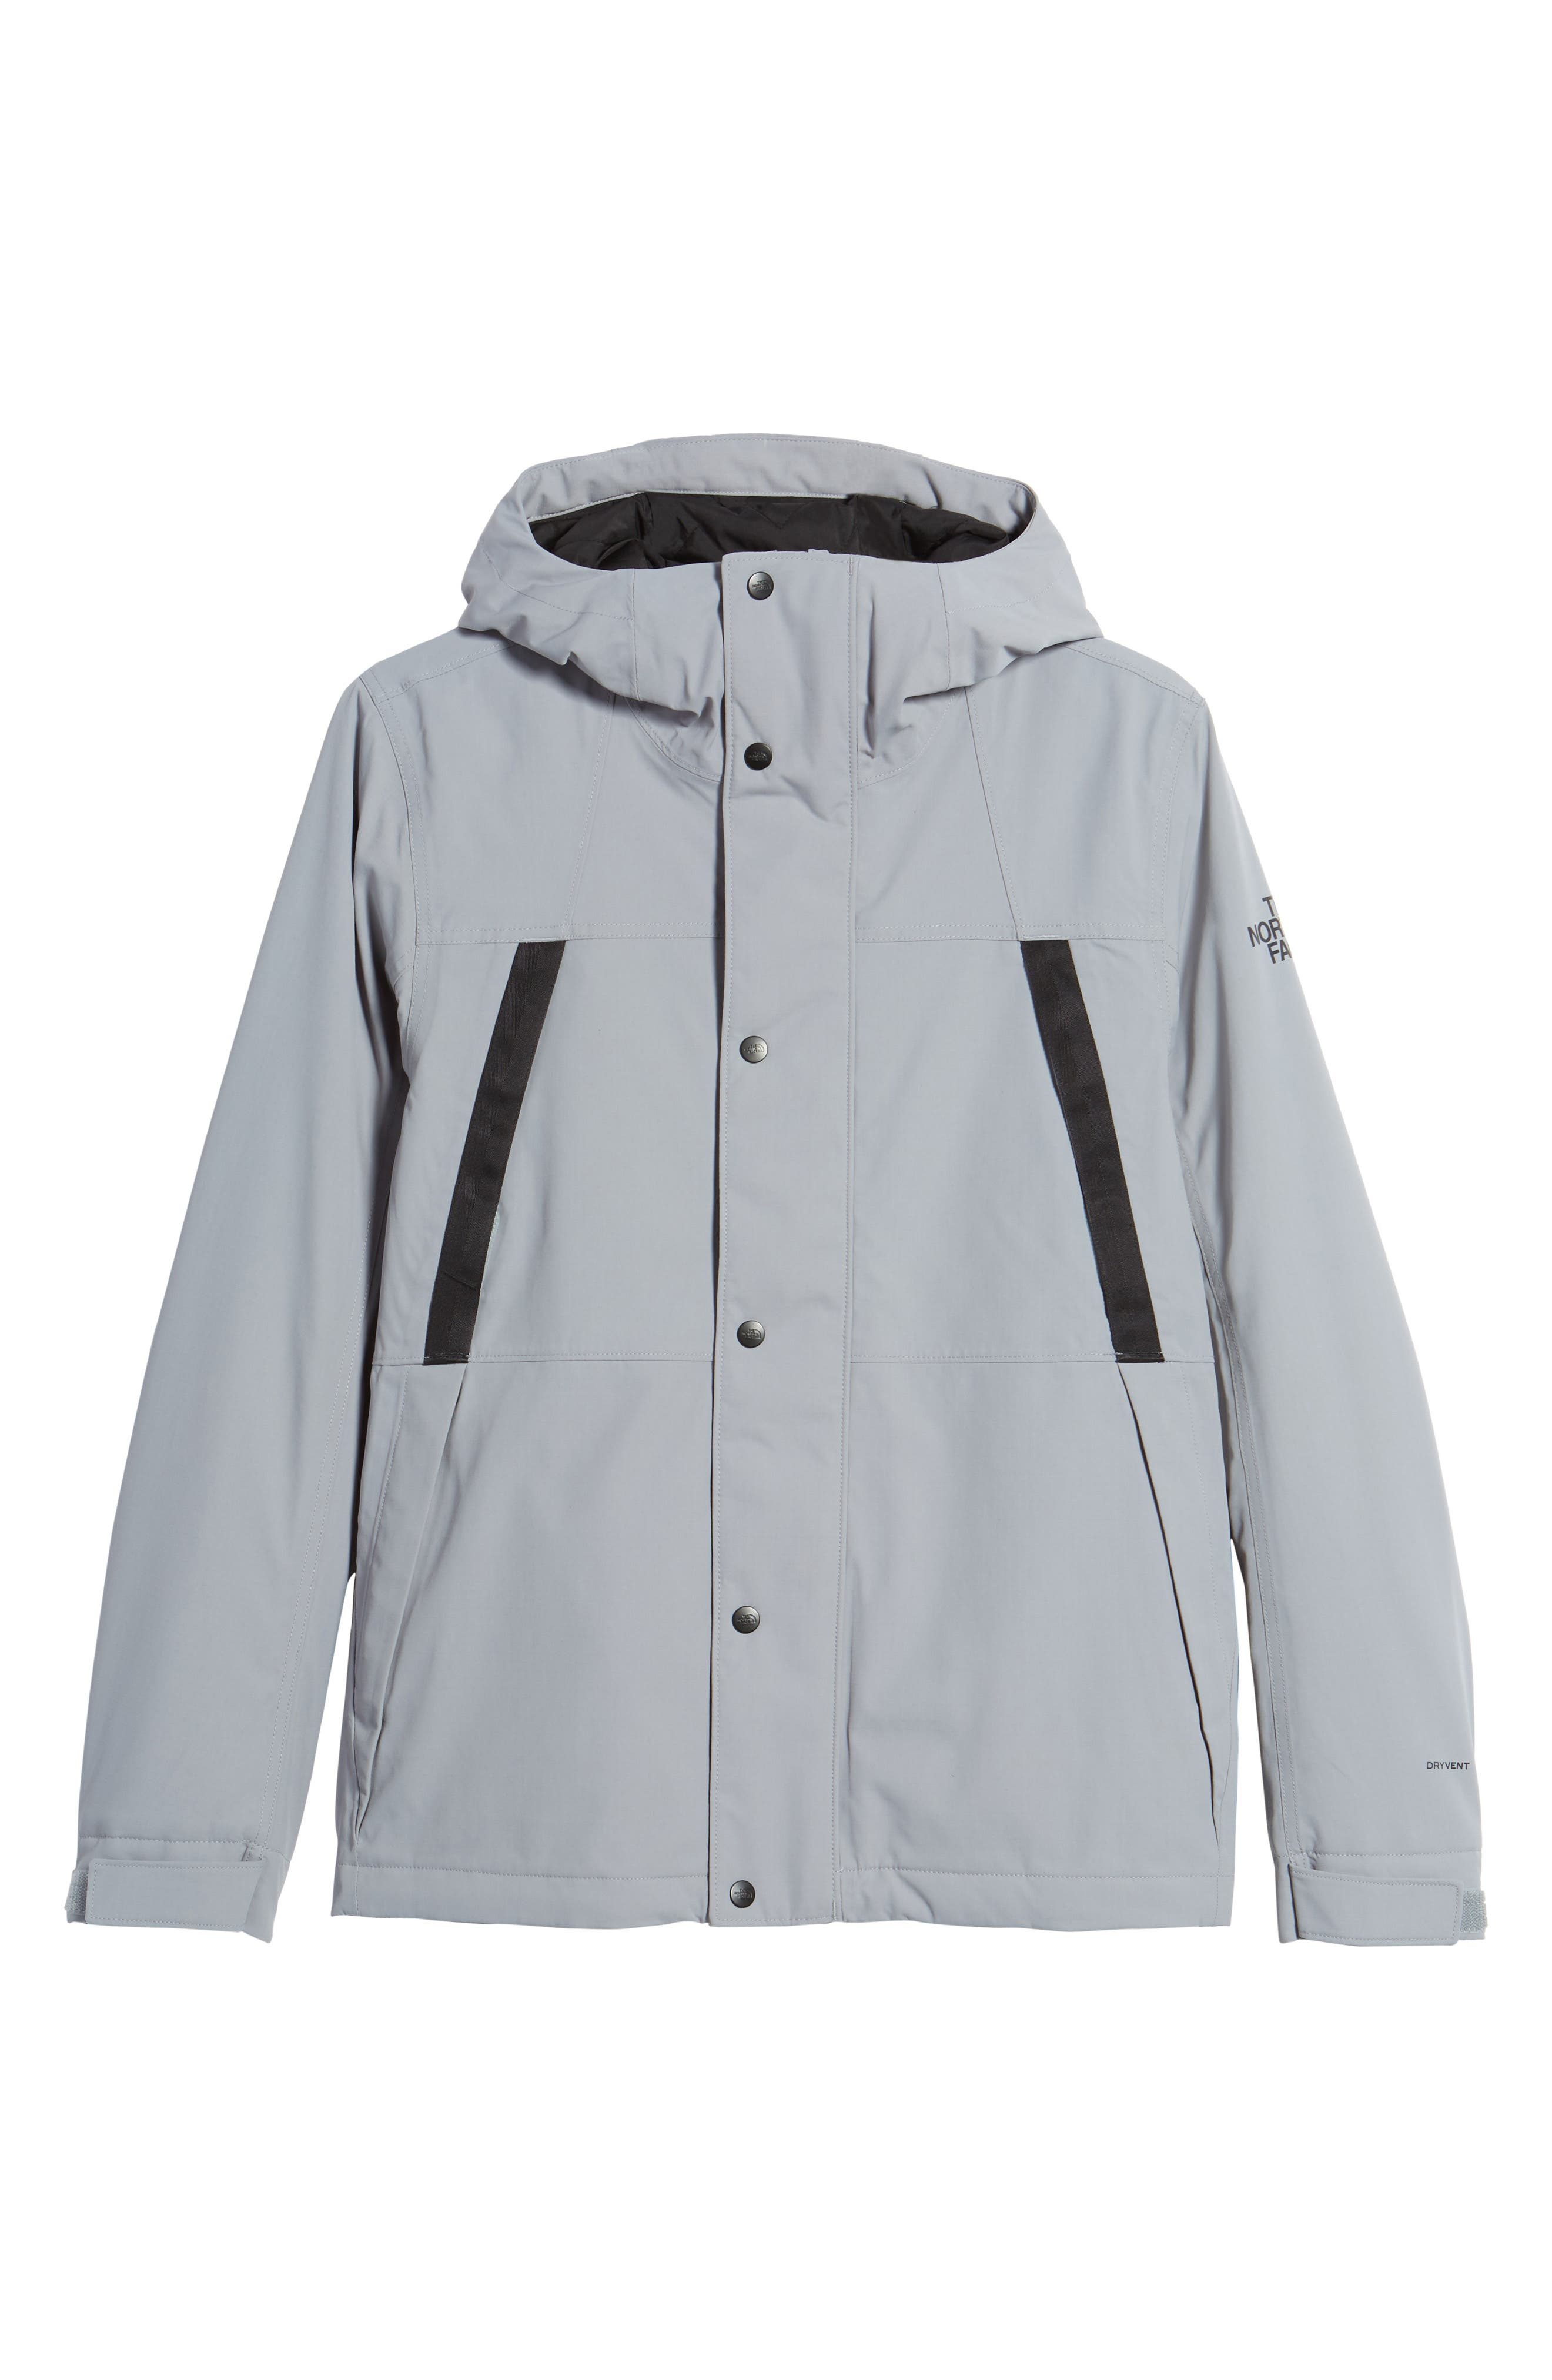 Stetler Insulated Rain Jacket,                             Alternate thumbnail 5, color,                             MID GREY